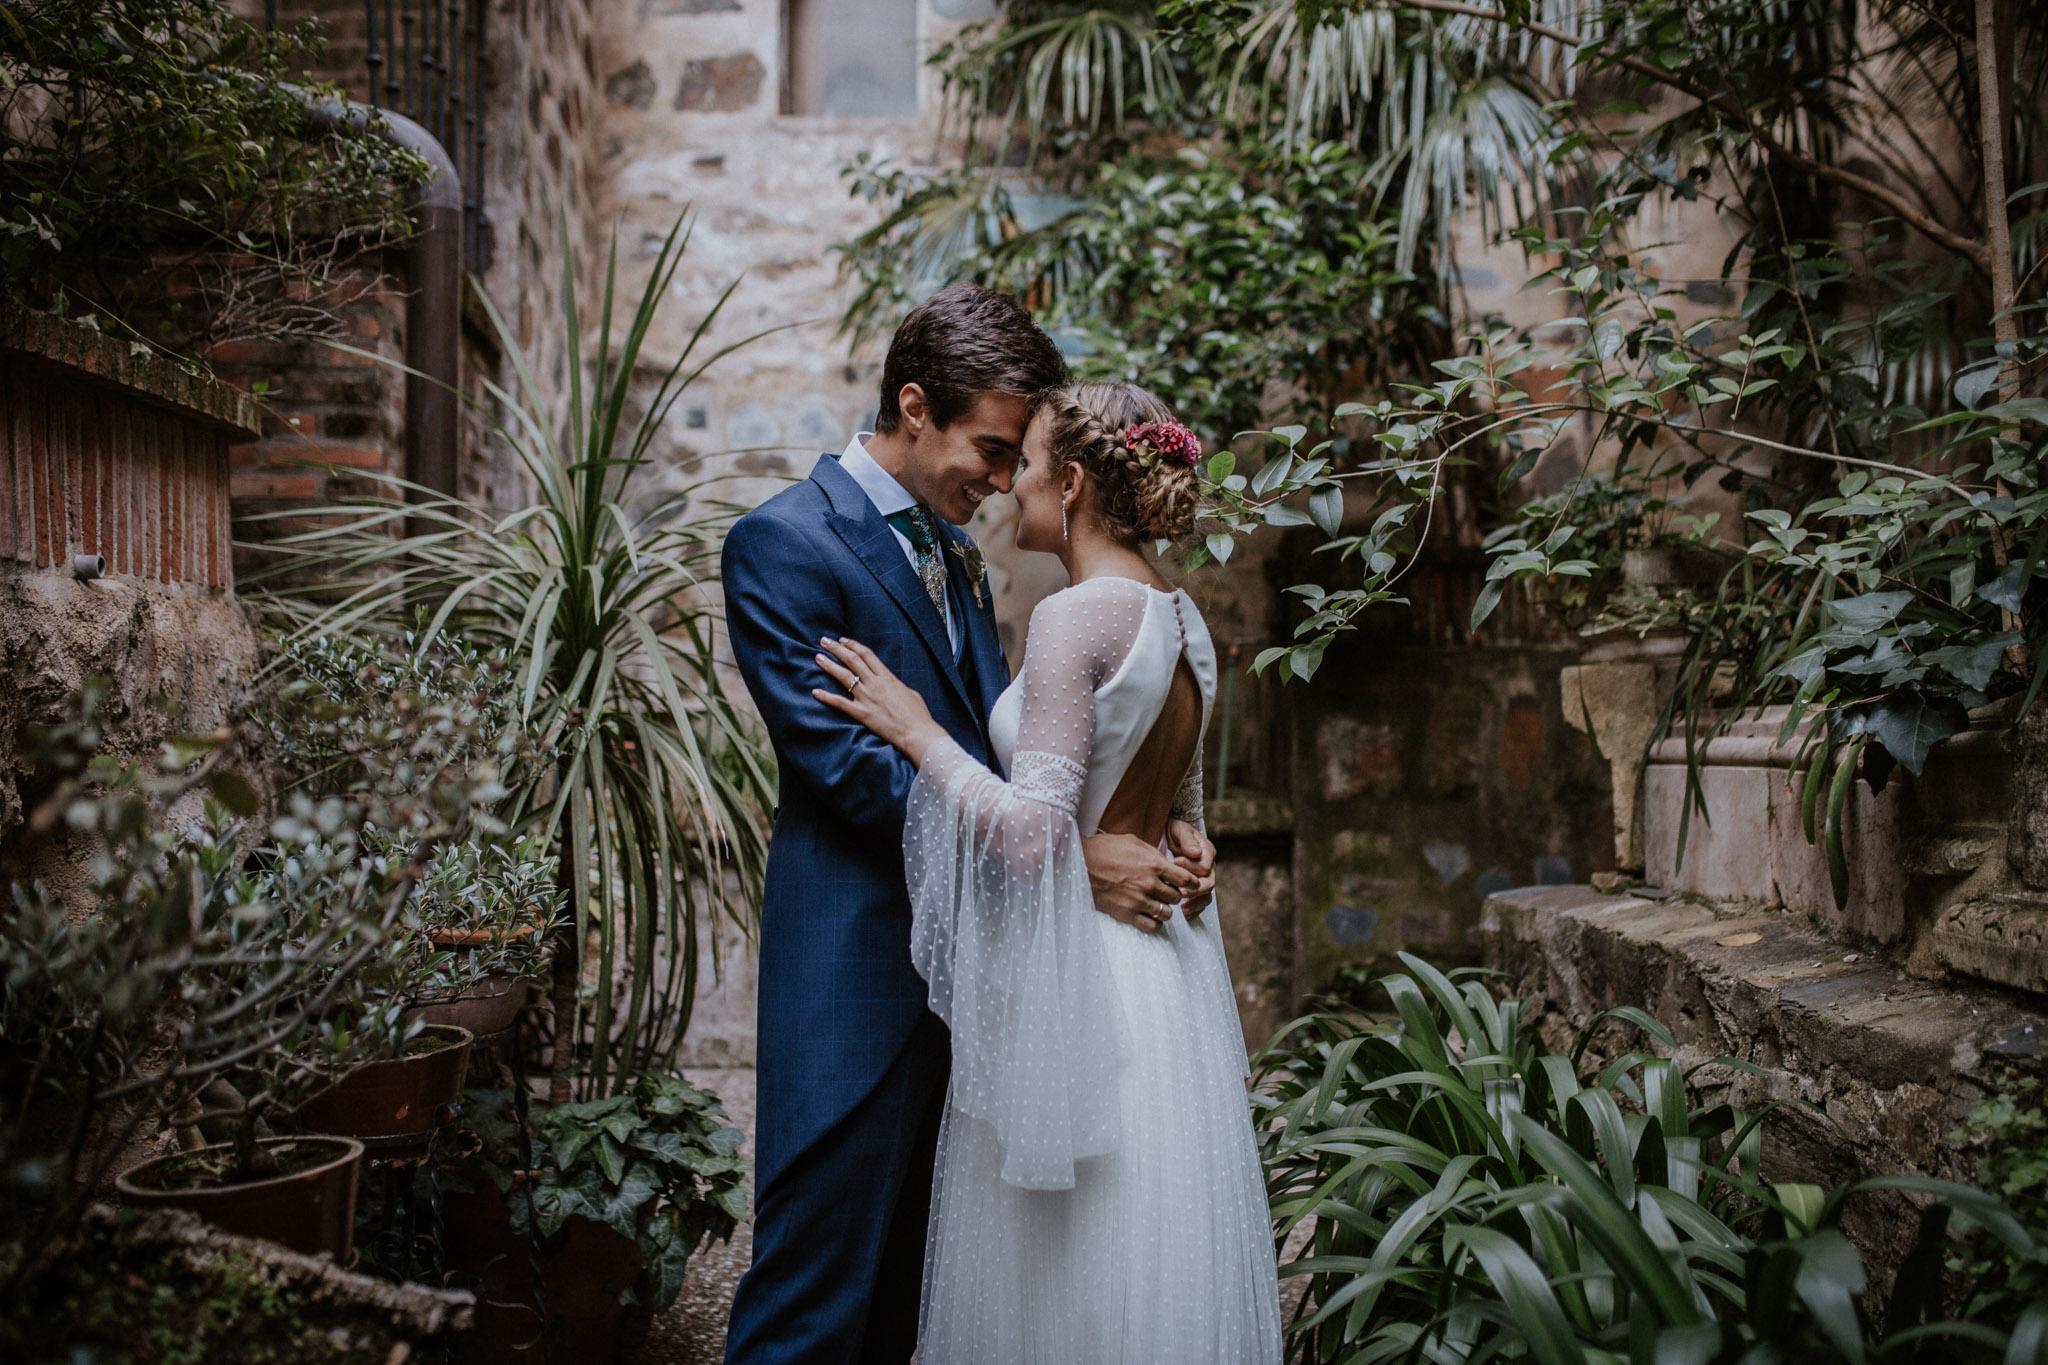 fotografia-boda-wedding-photographer-spain-concorazon-223